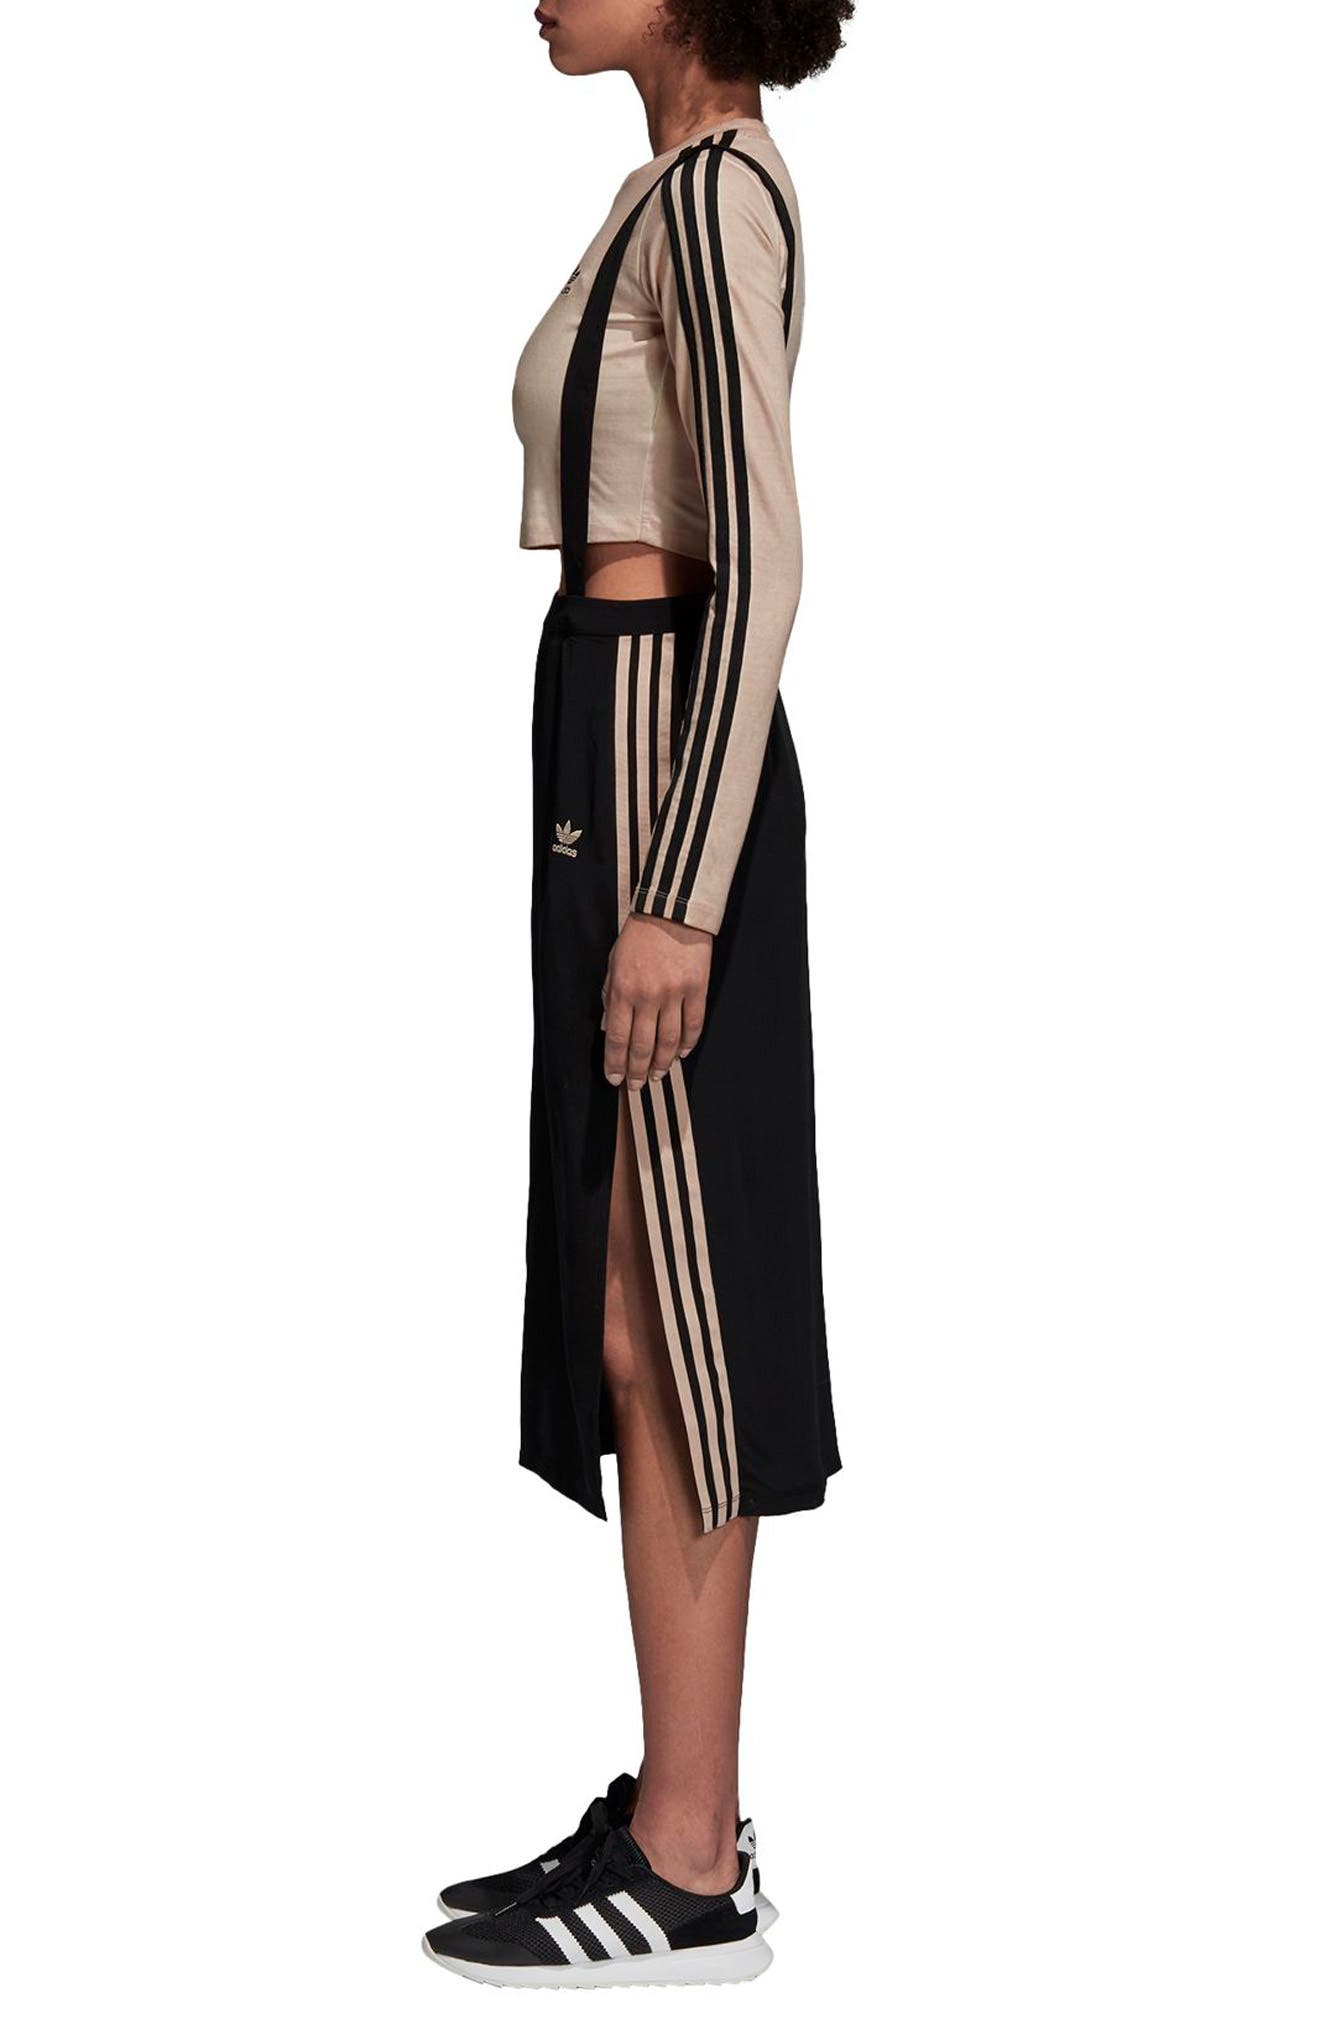 ADIDAS ORIGINALS,                             Midi Skirt with Shoulder Straps,                             Alternate thumbnail 3, color,                             001